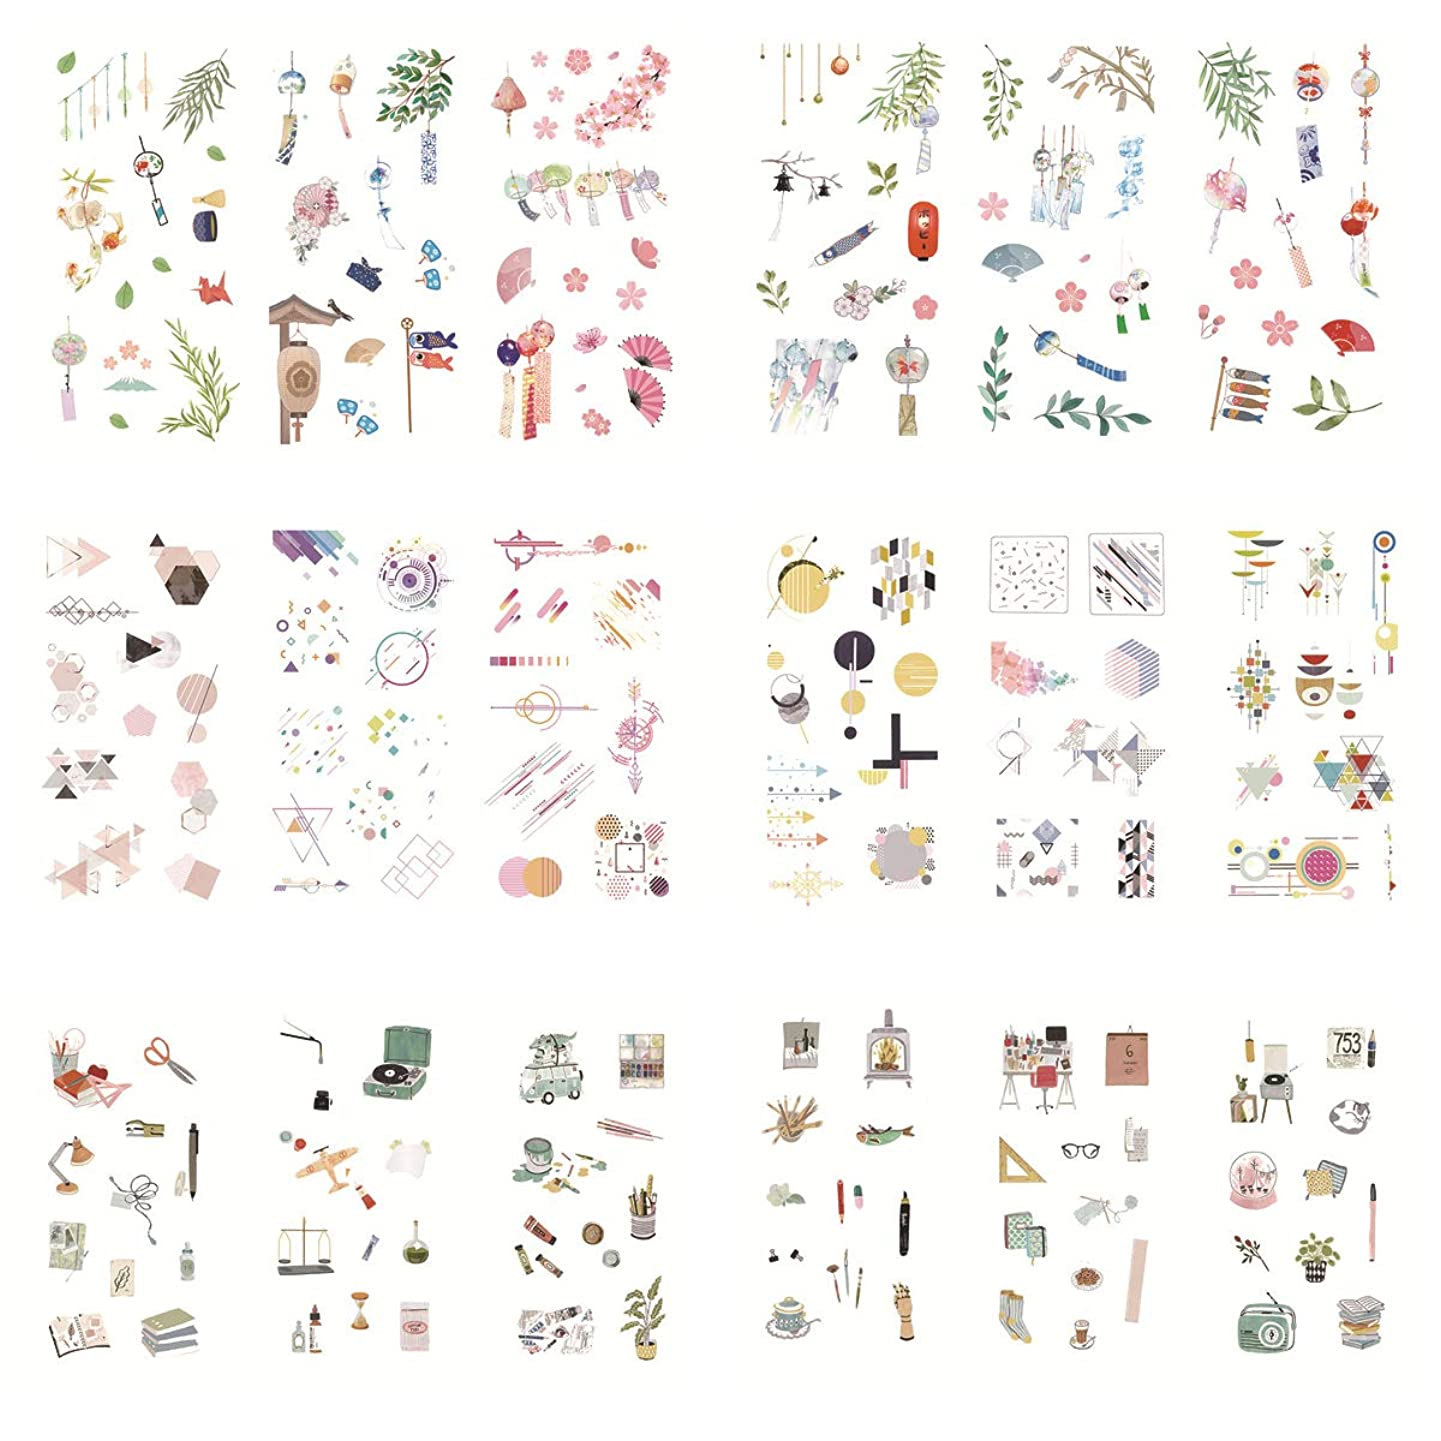 Japanese Style Lantern Geometric Shape Stuff Office Supplies Self-Adhesive Washi Paper Stationery Sticker Set Decoration Label for Scrapbooking DIY Diary Album Notebook Journal Agenda (H)